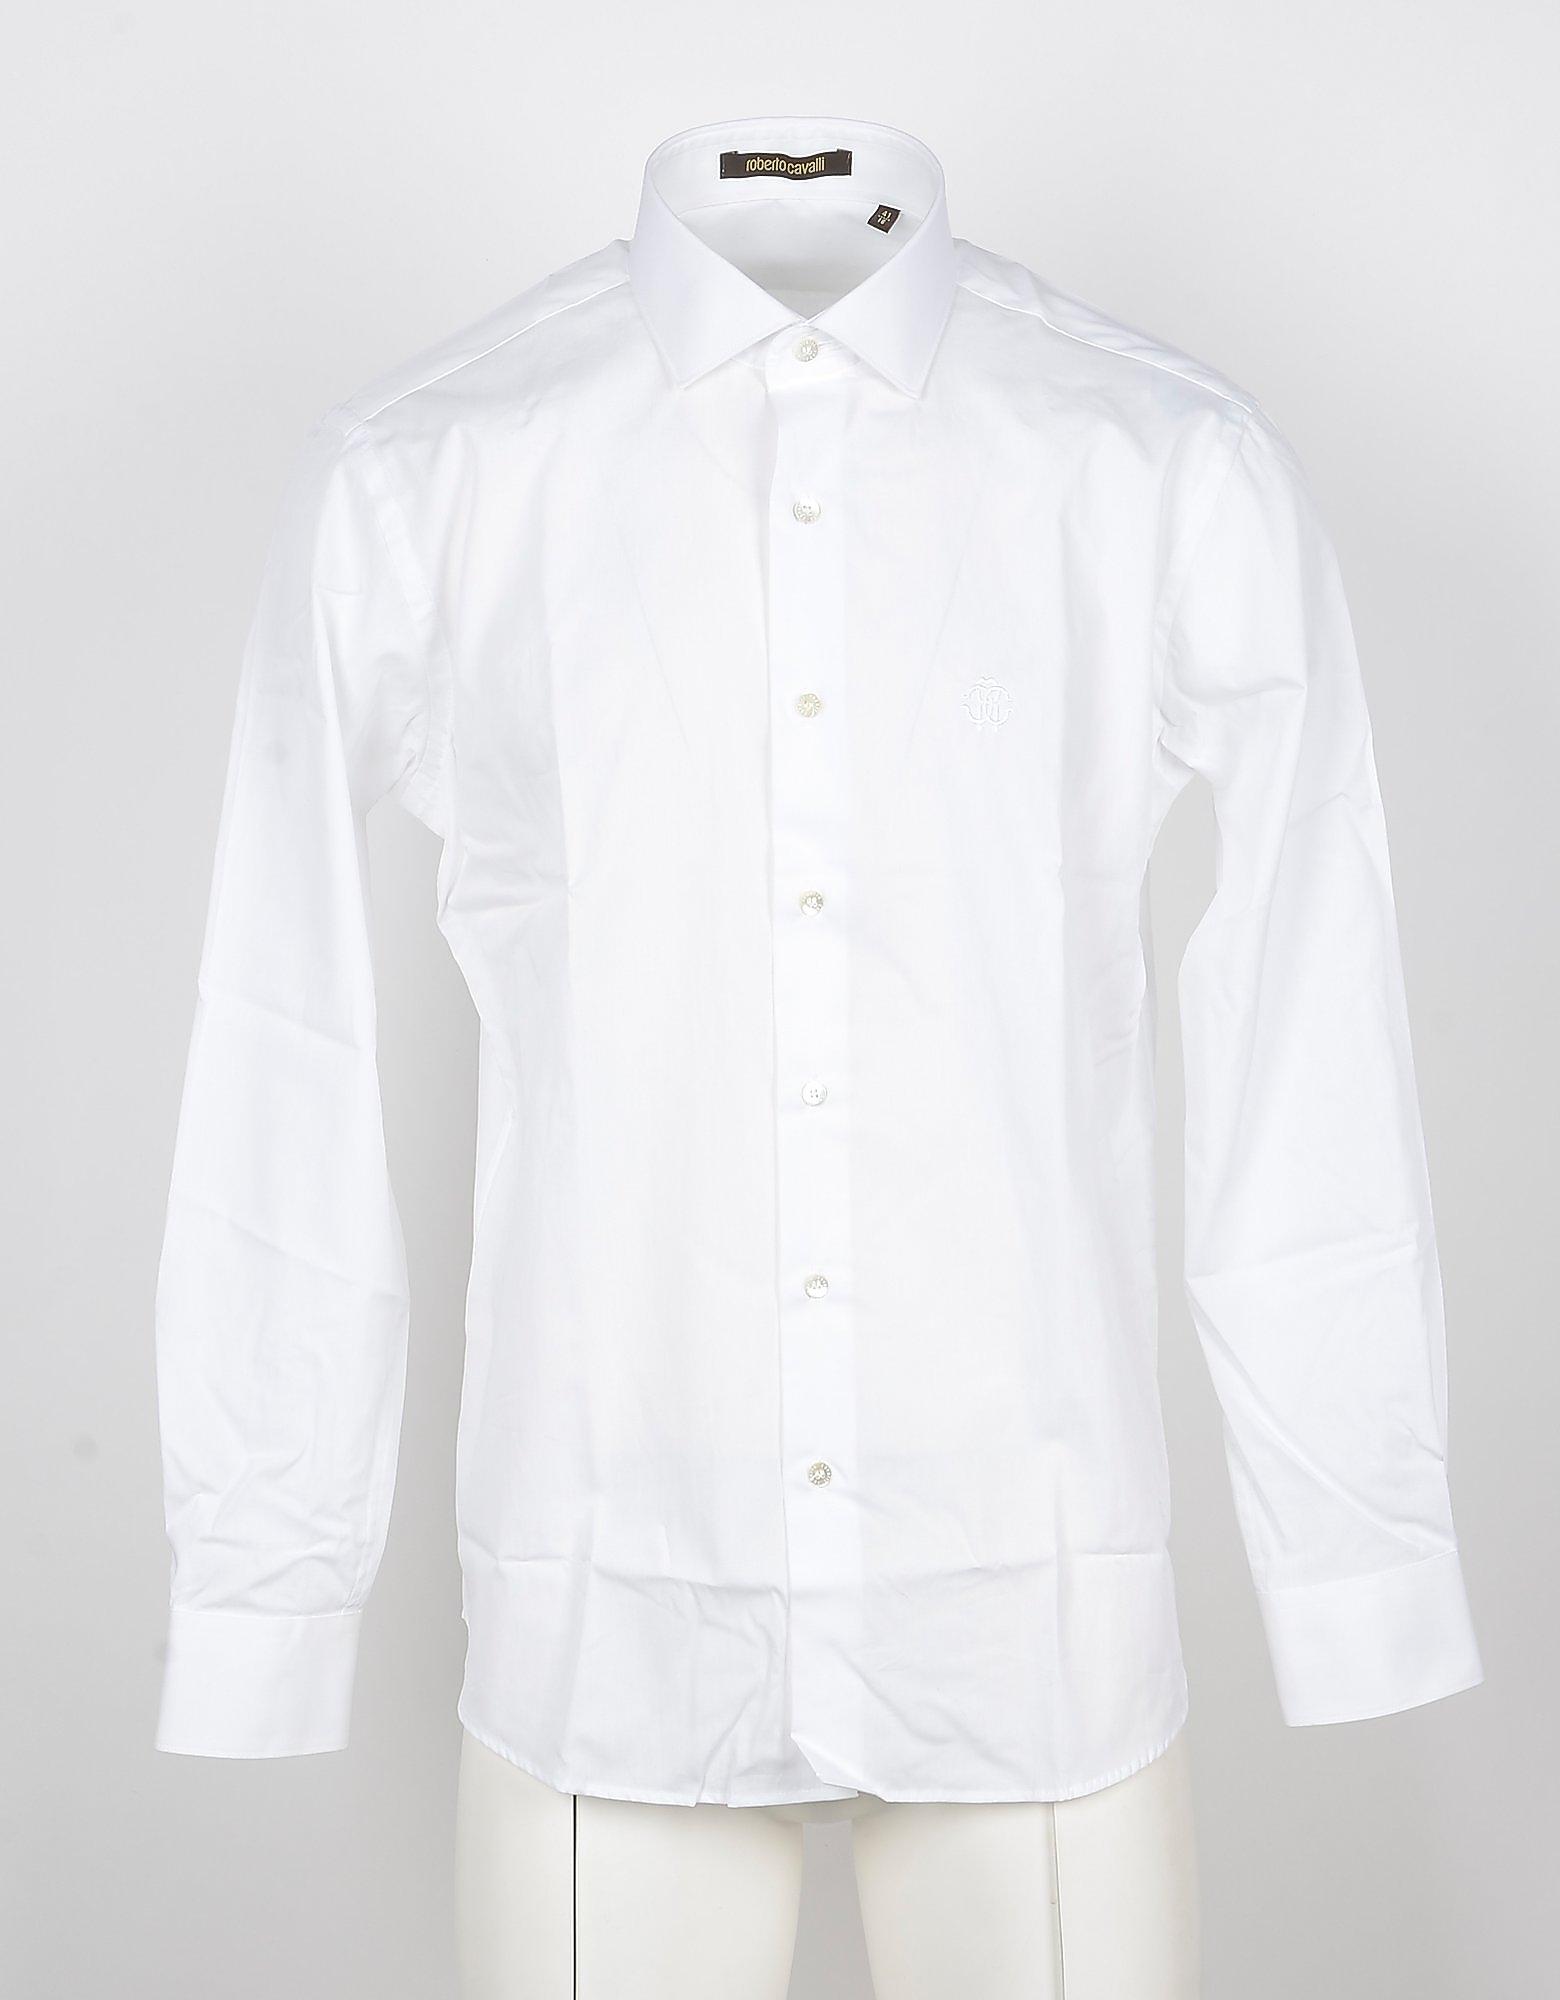 Roberto Cavalli Designer Shirts, Long-Sleeved White Cotton Men's Shirt